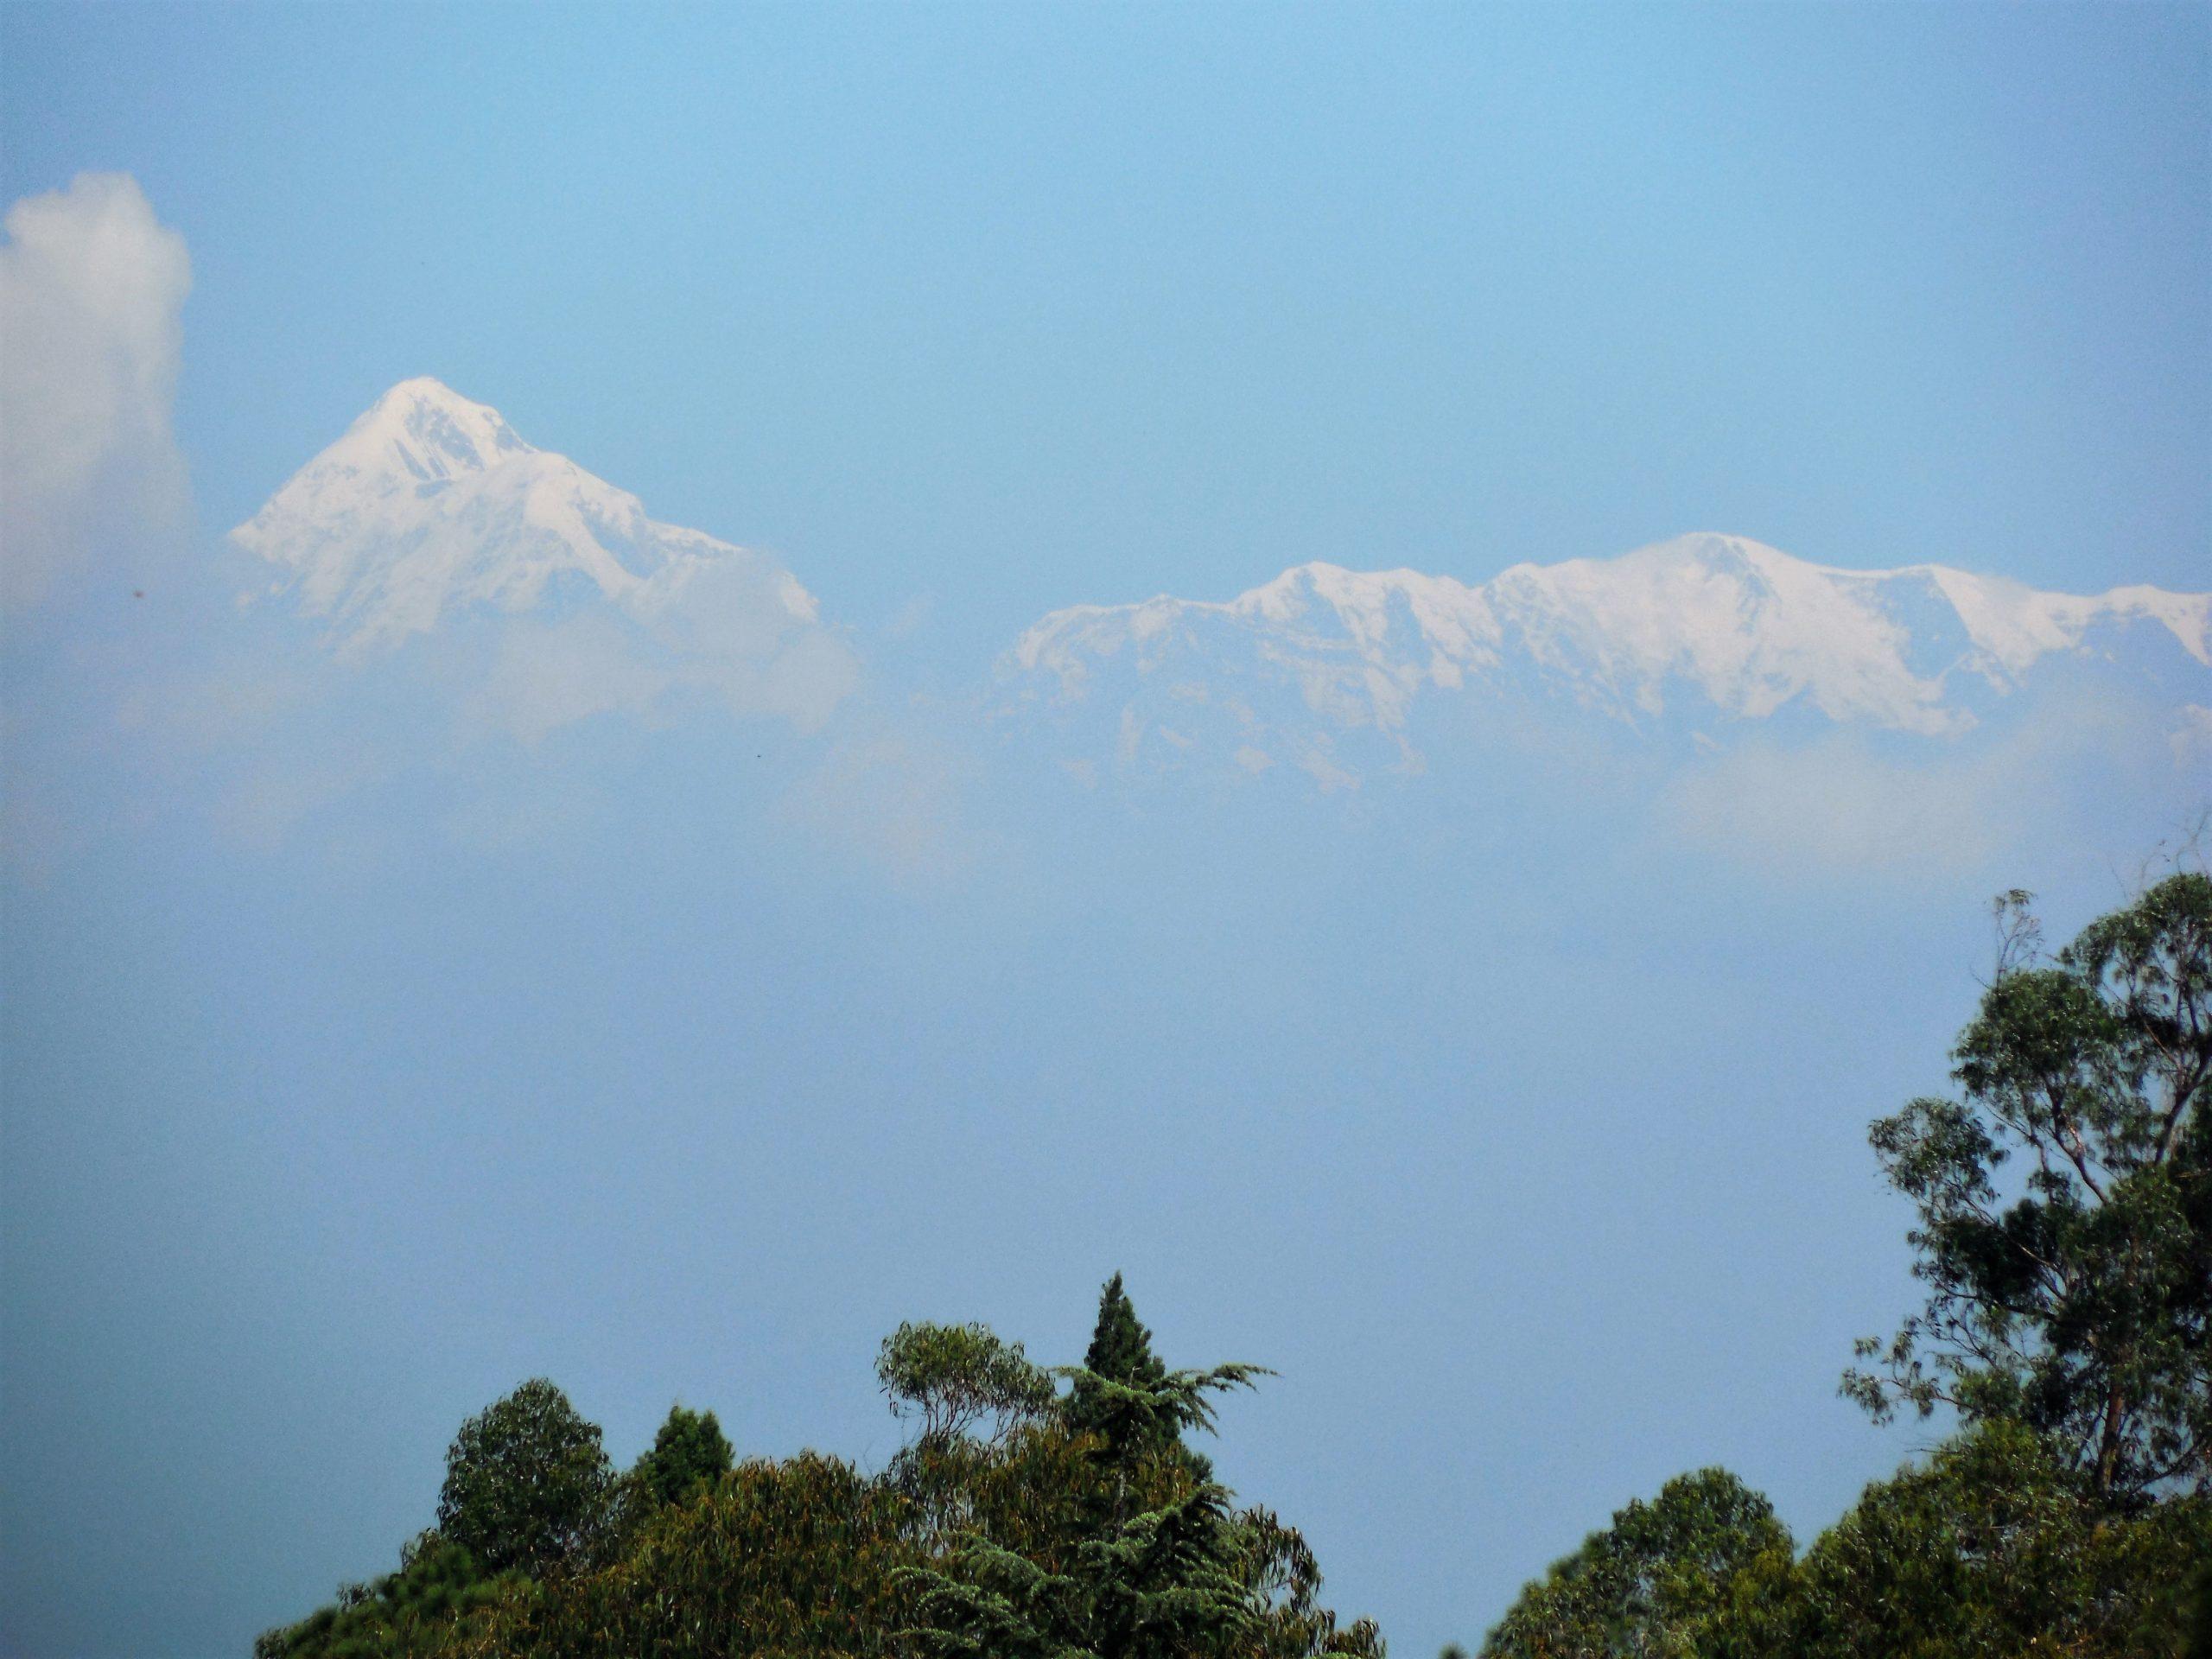 Himalayan peaks view from Ranikhet